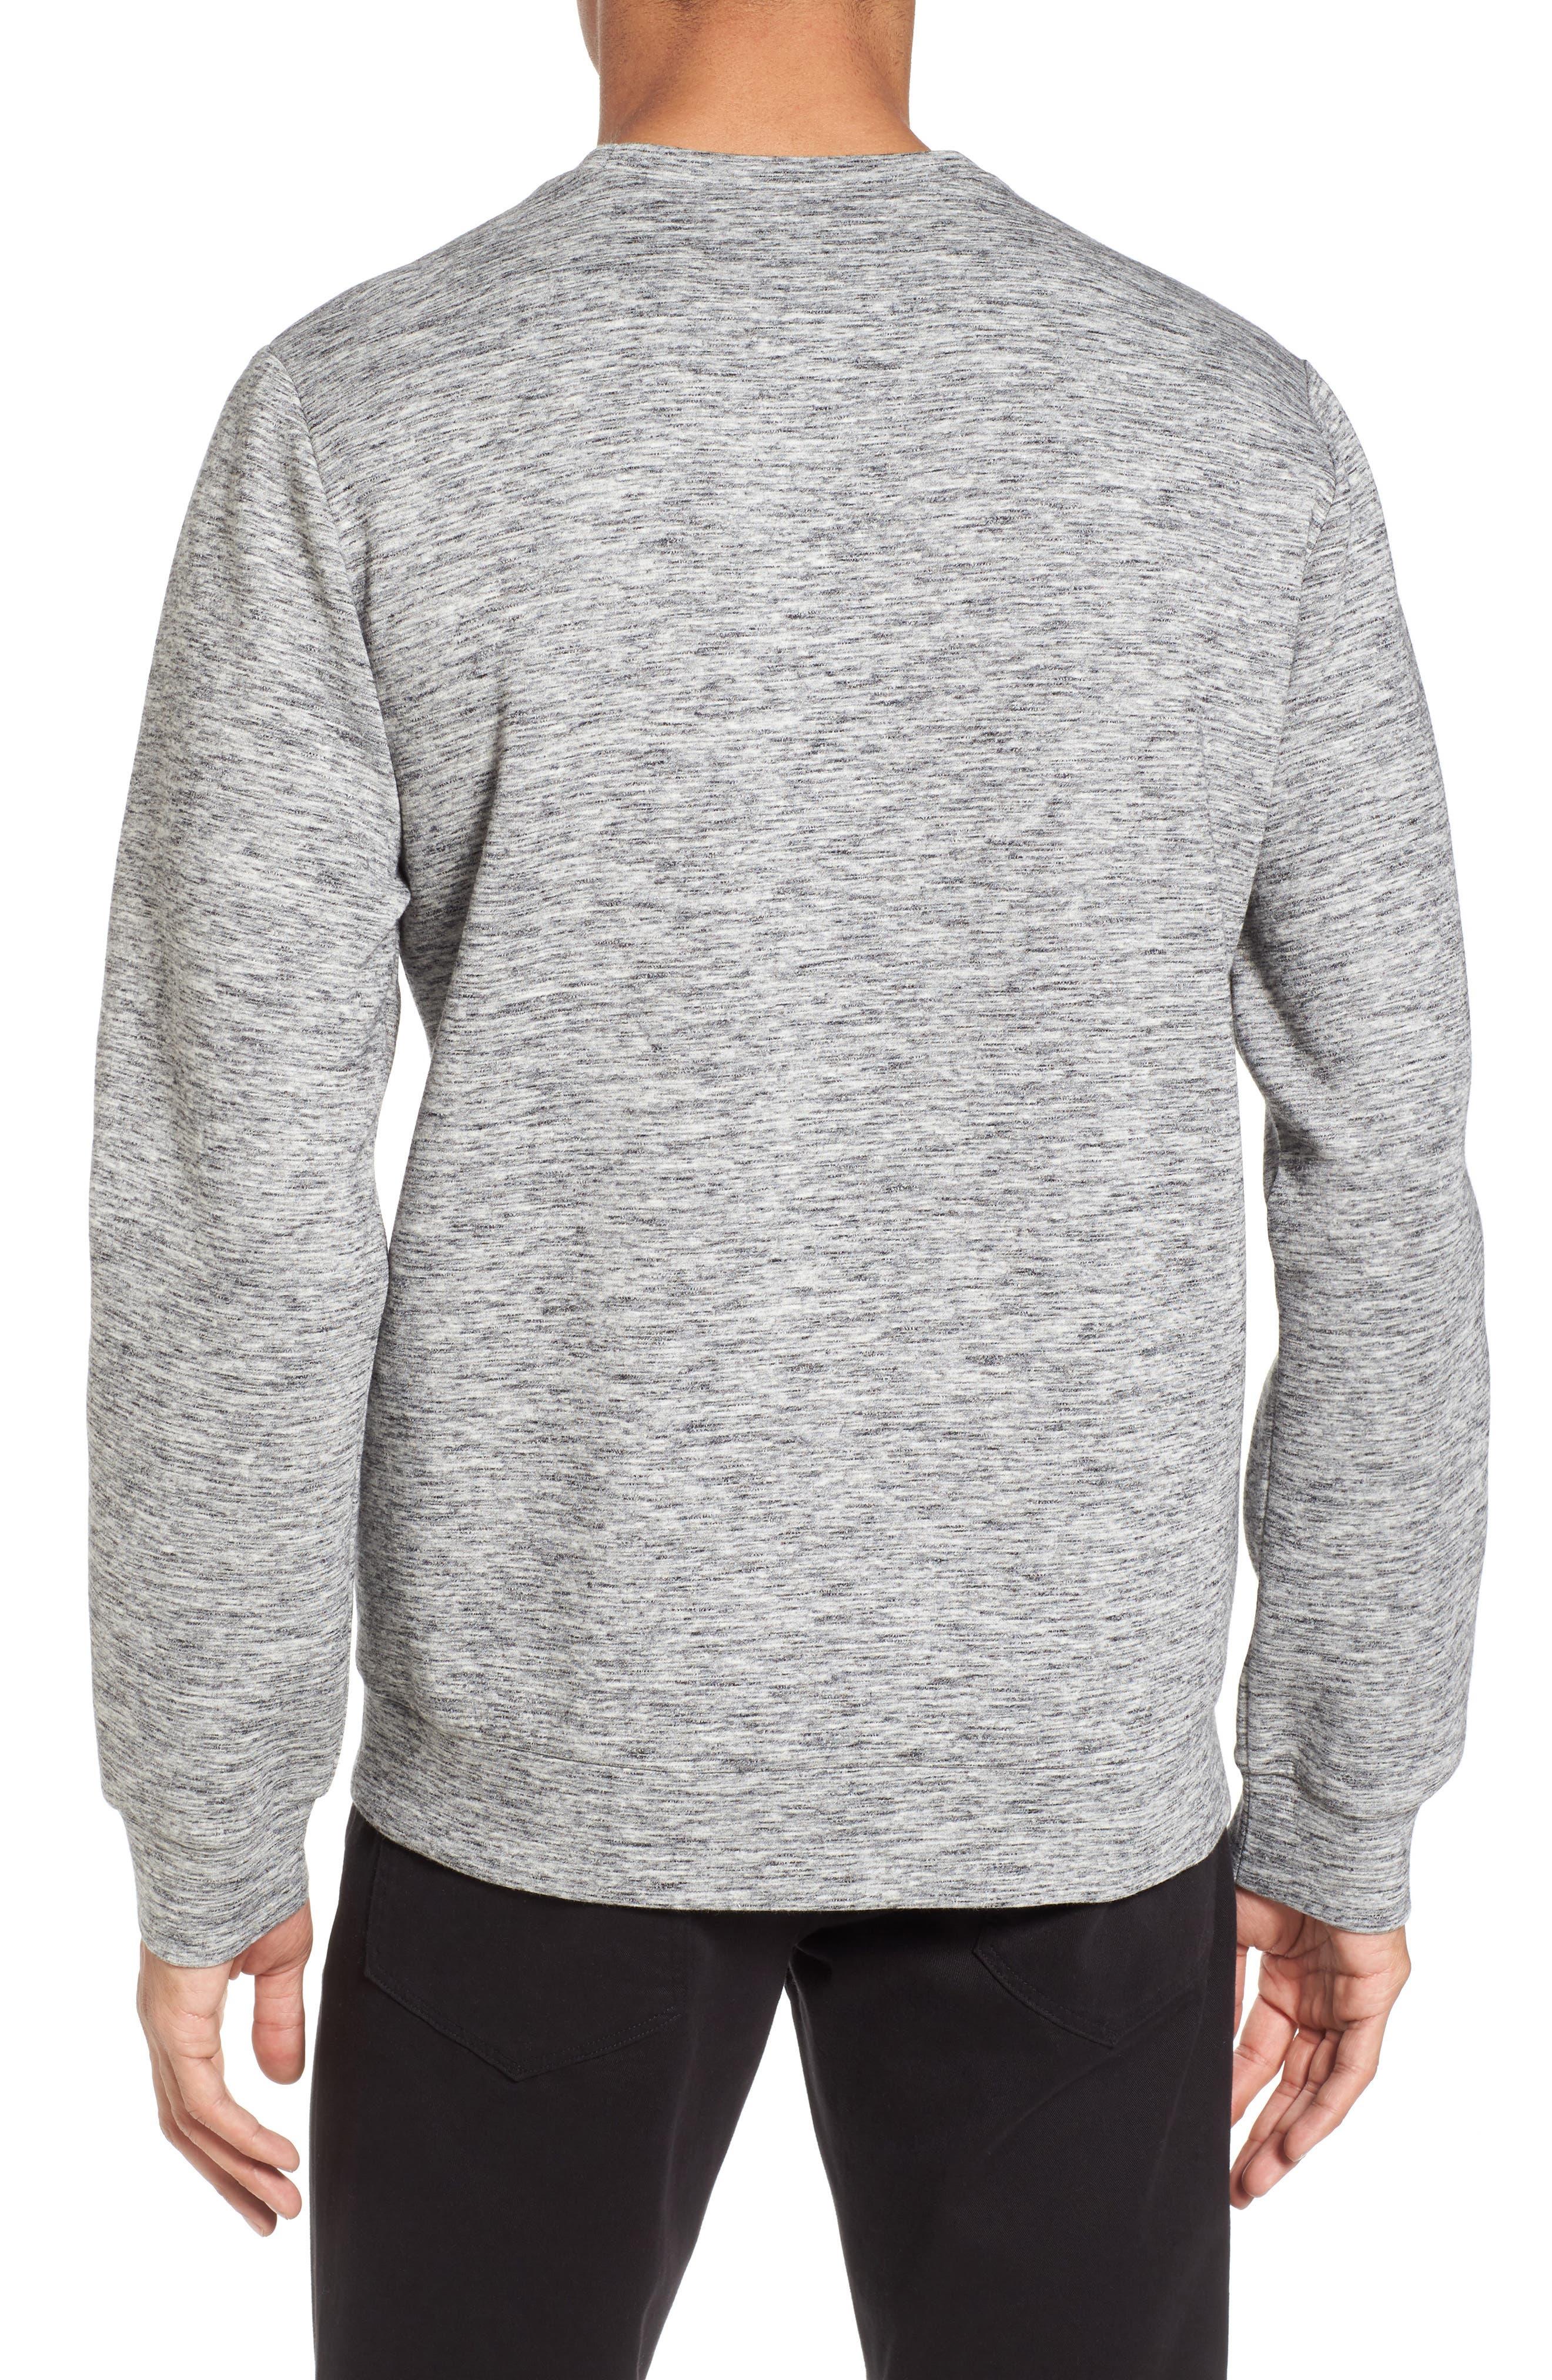 Space Dyed Sweatshirt,                             Alternate thumbnail 2, color,                             030